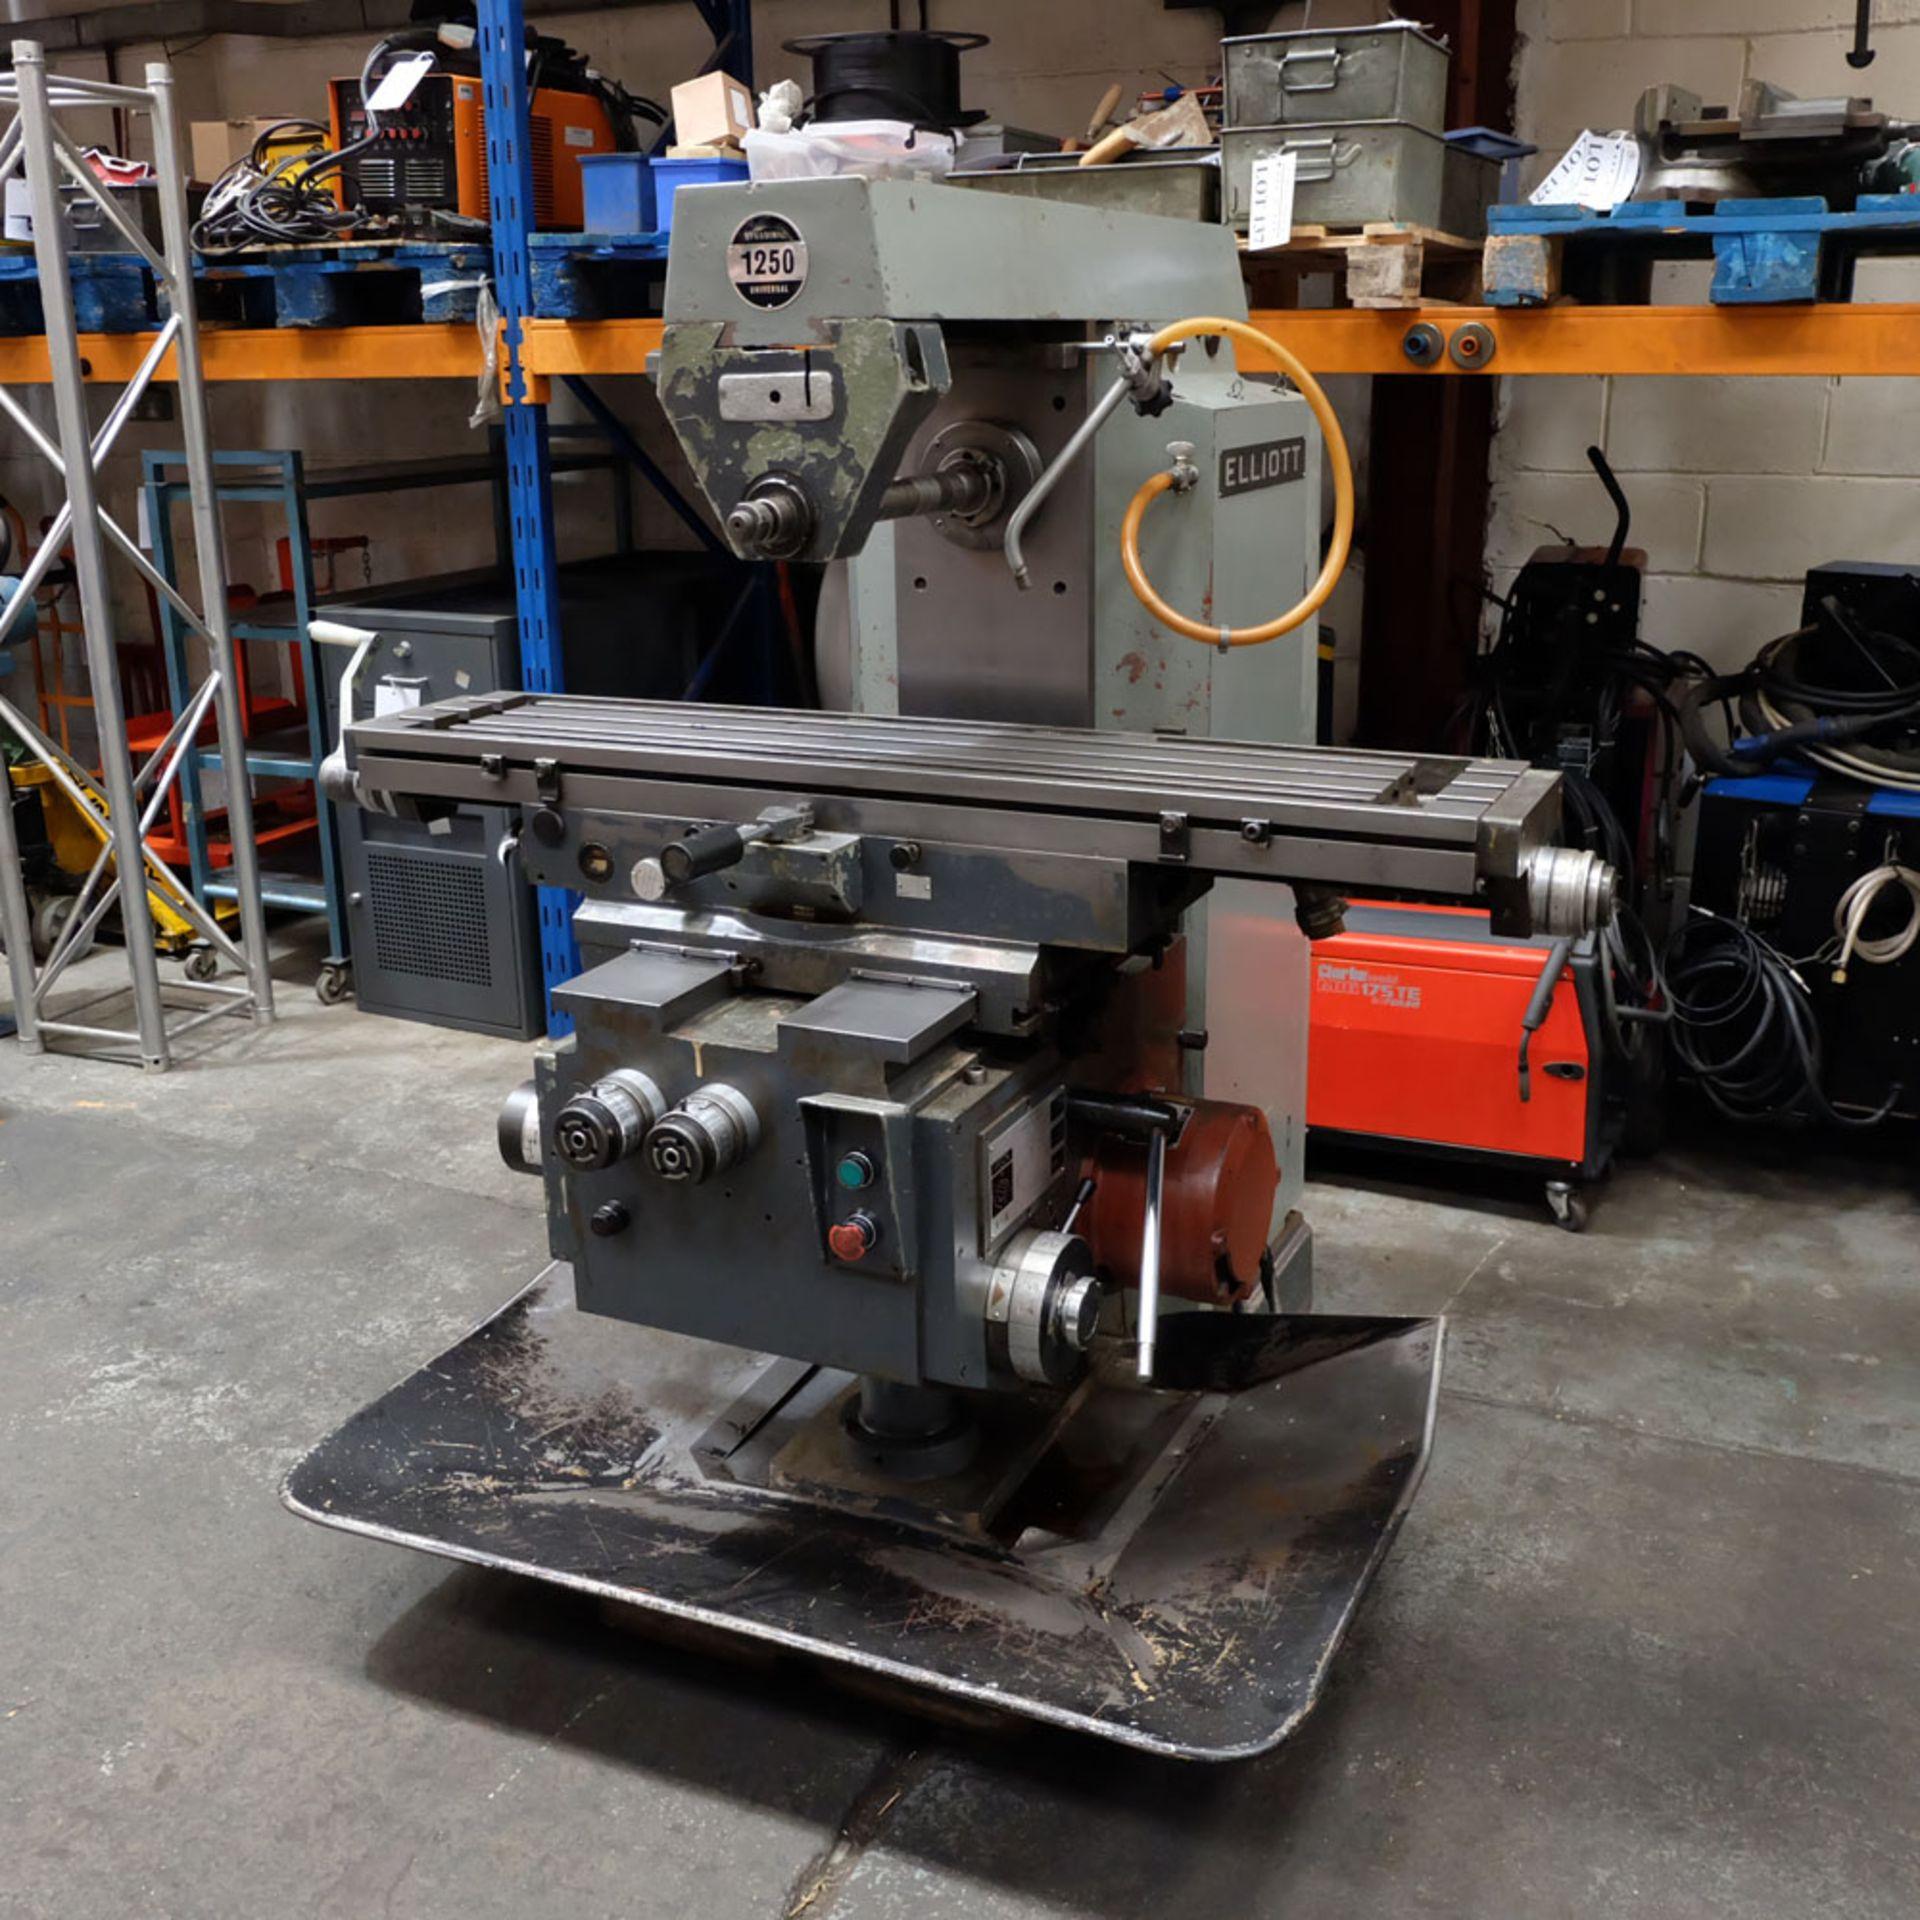 Elliott Horizontal Milling Machine.